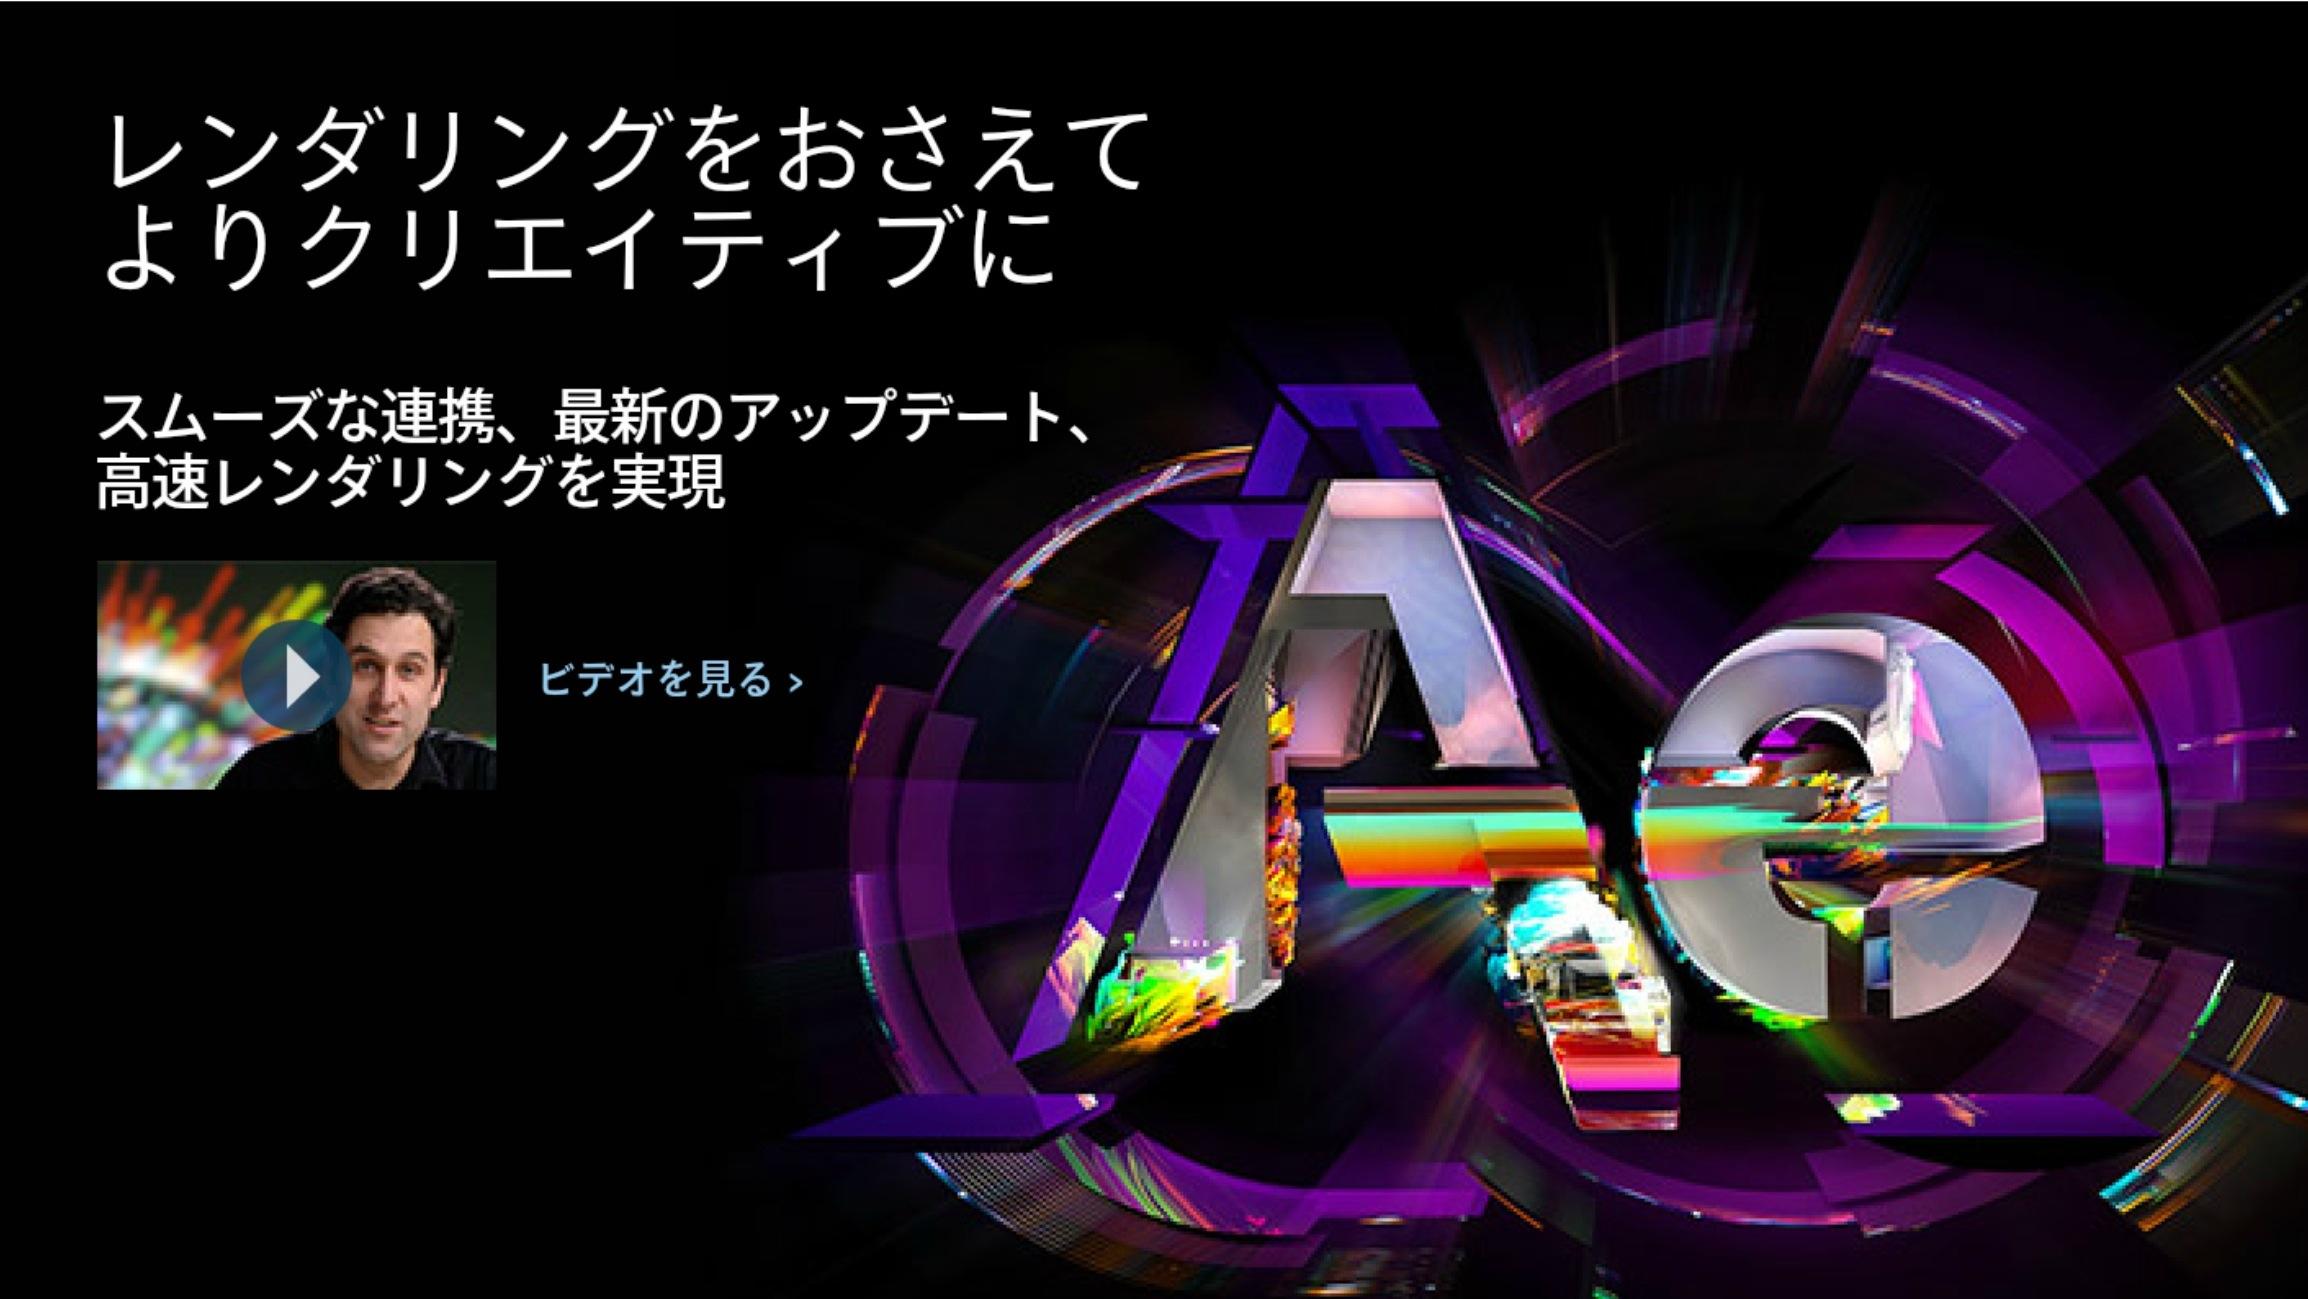 Adobe AfterEffects プロ向け仕様で最強のツールです。